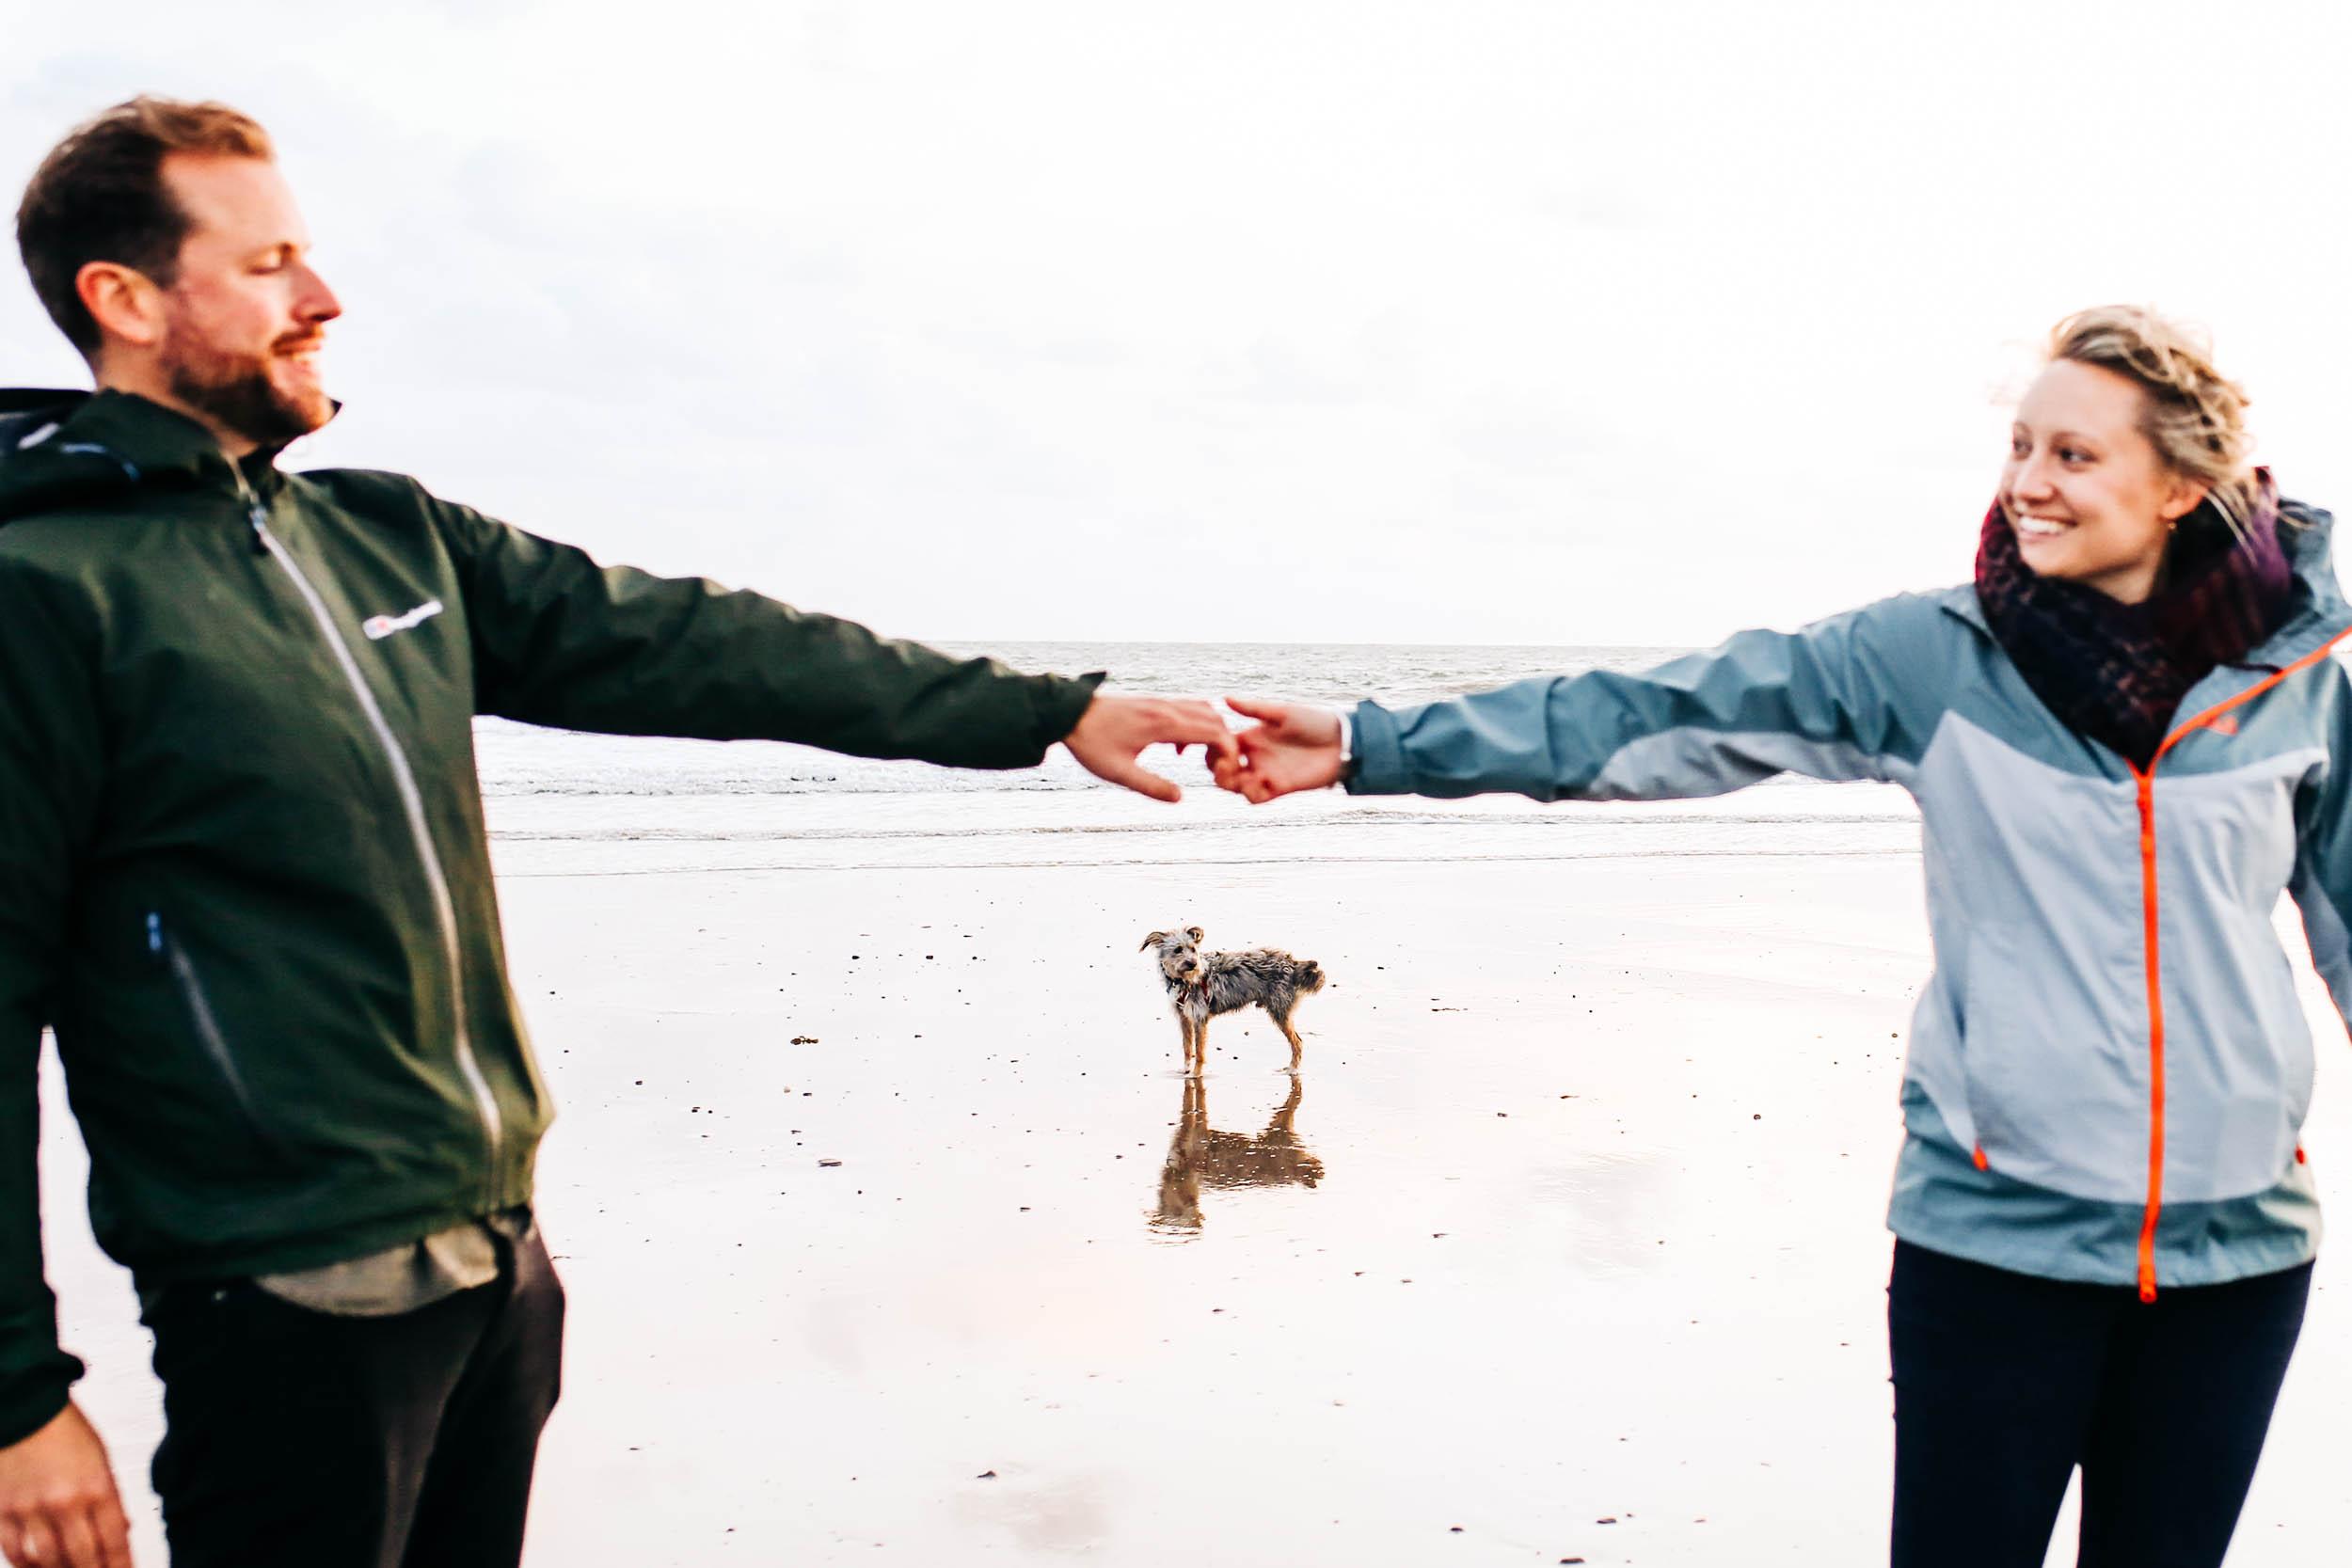 Alex_Sedgmond_Photography-MerthyrMawr-PreweddingPhotography-Penny&Mike-20.jpg